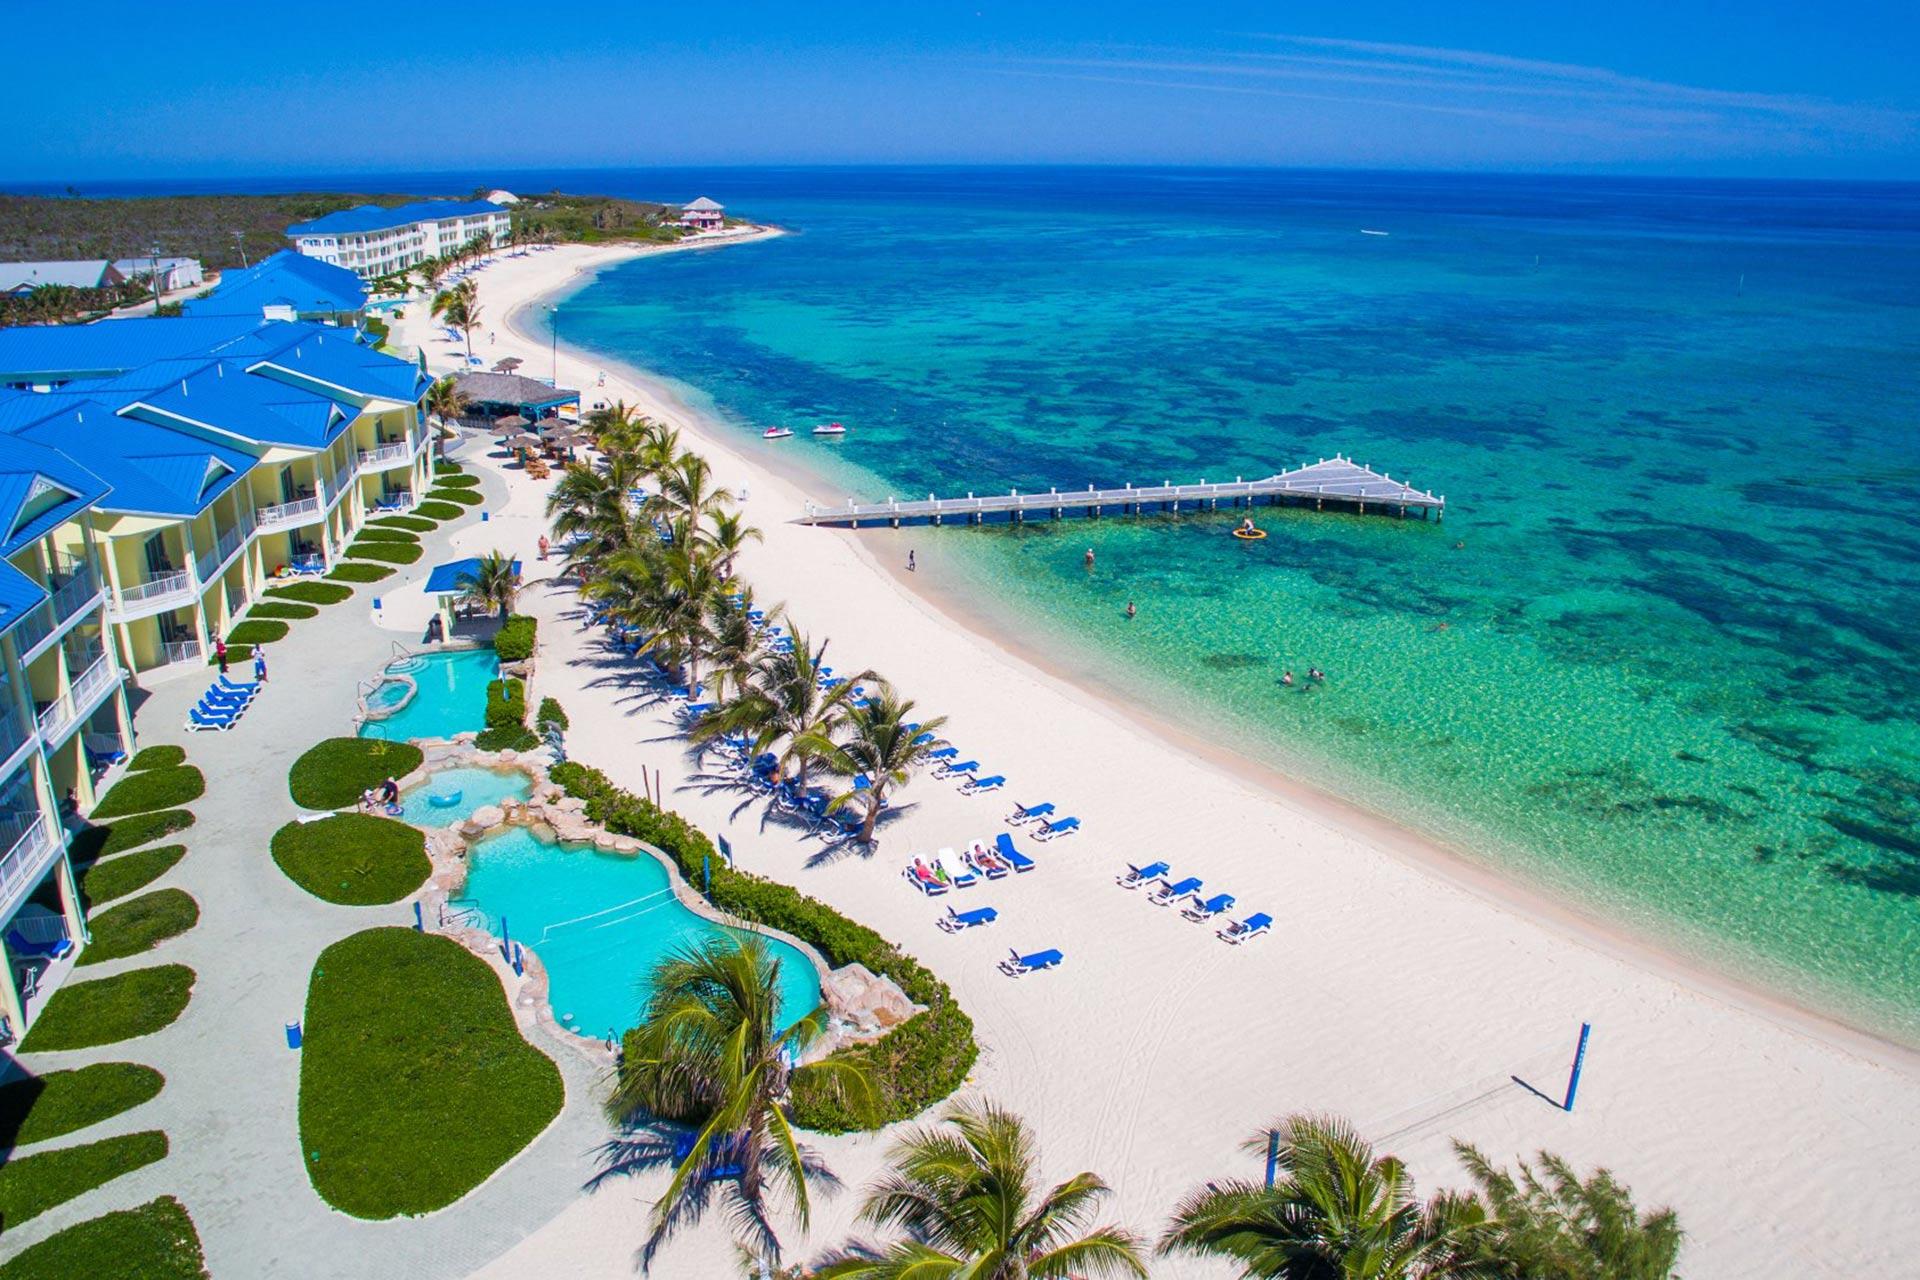 Wyndham Reef Resort in Cayman Islands